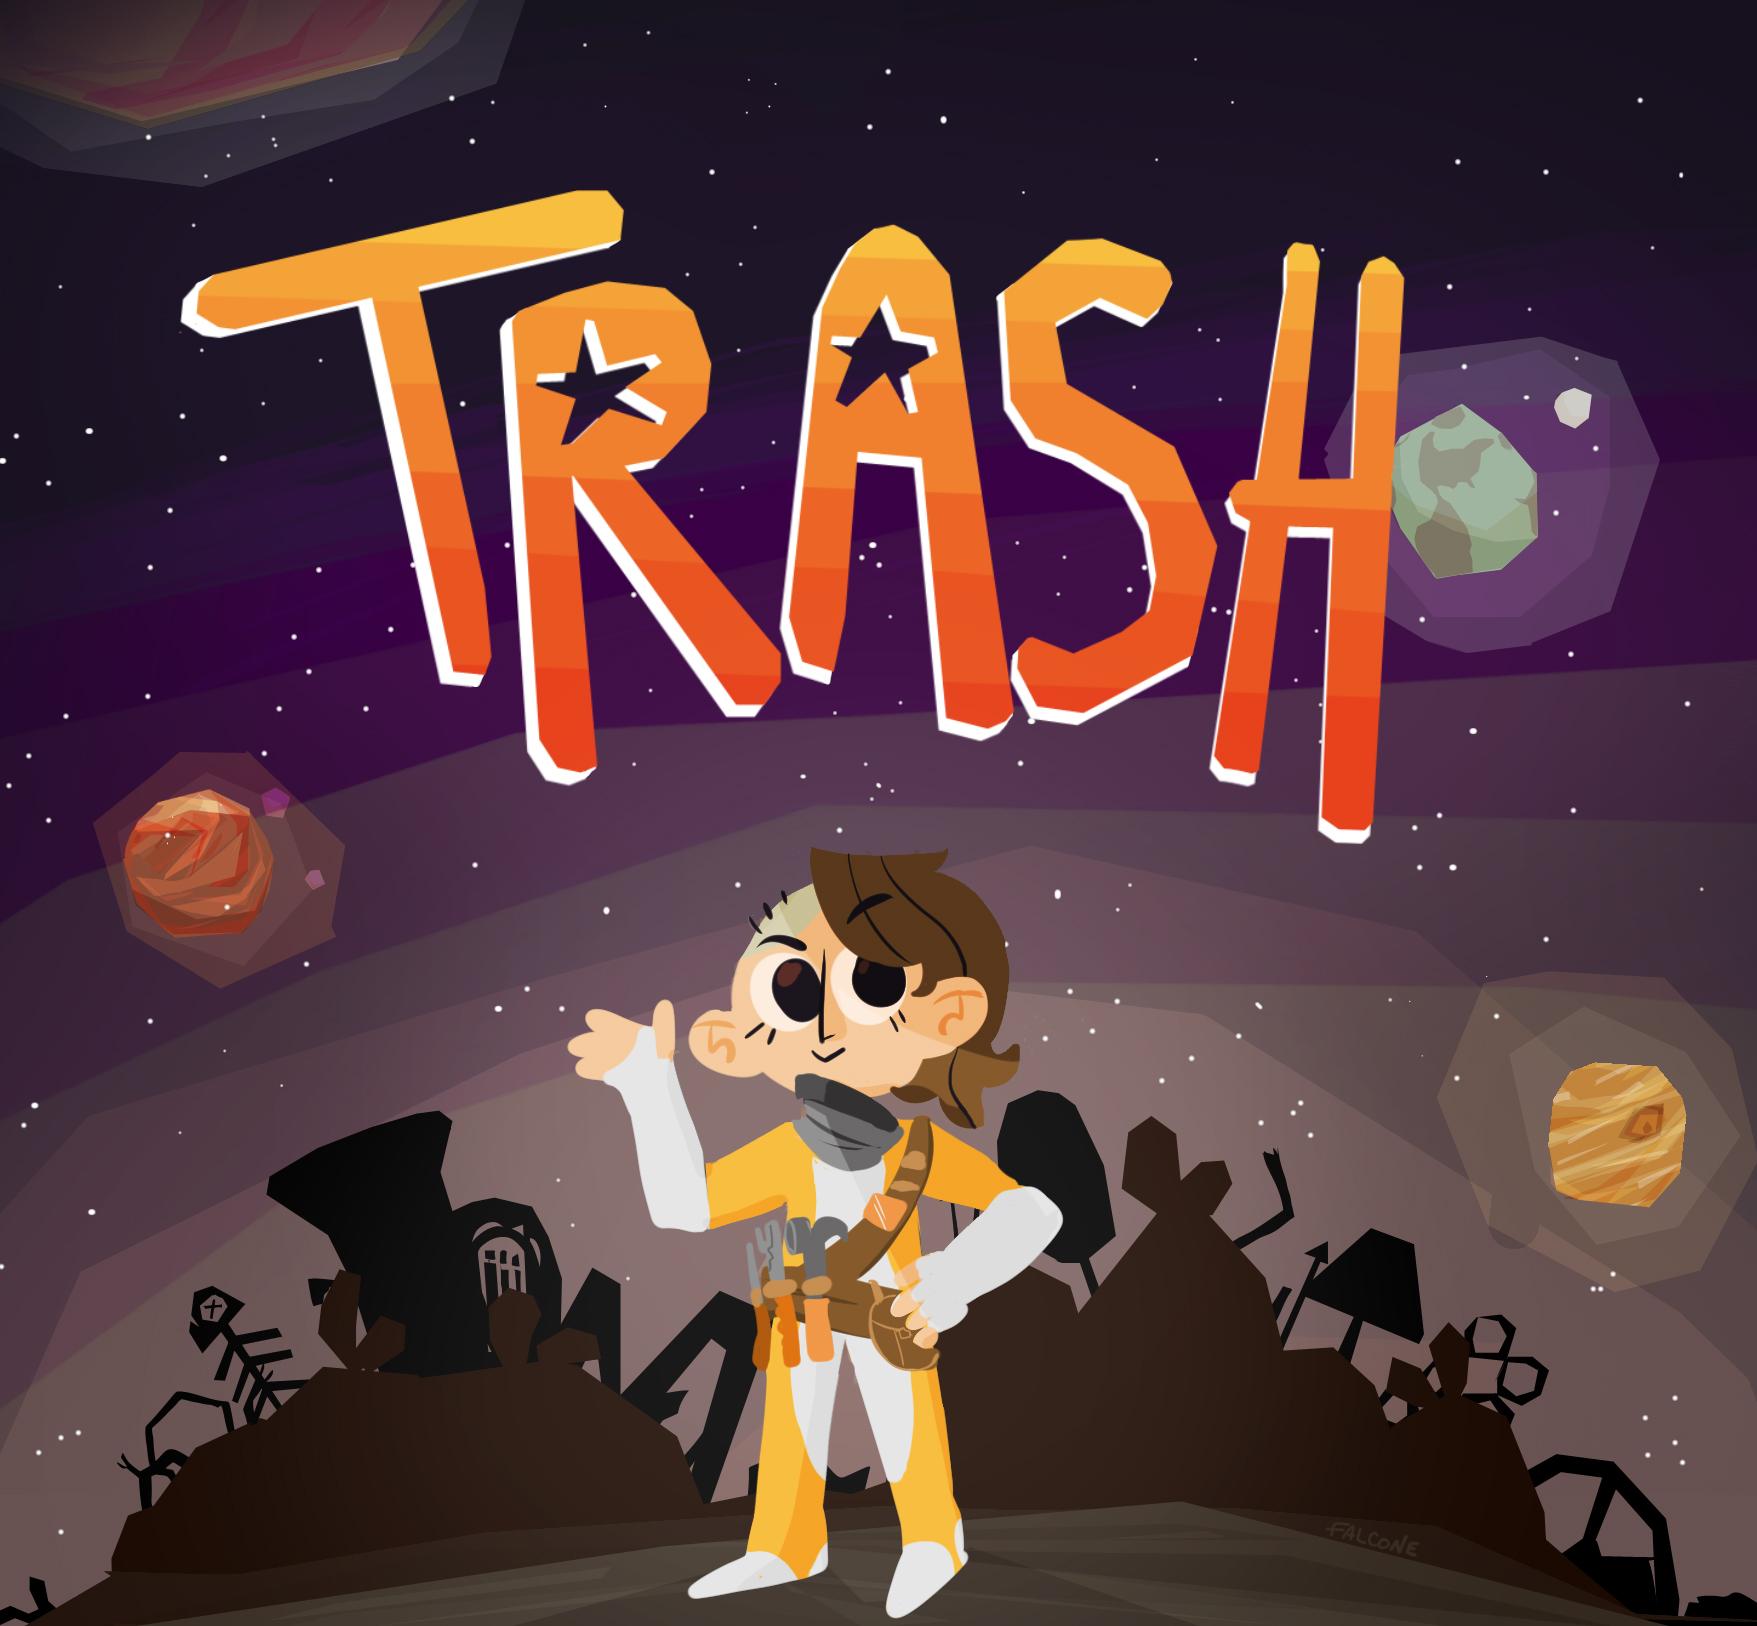 trashh.jpg